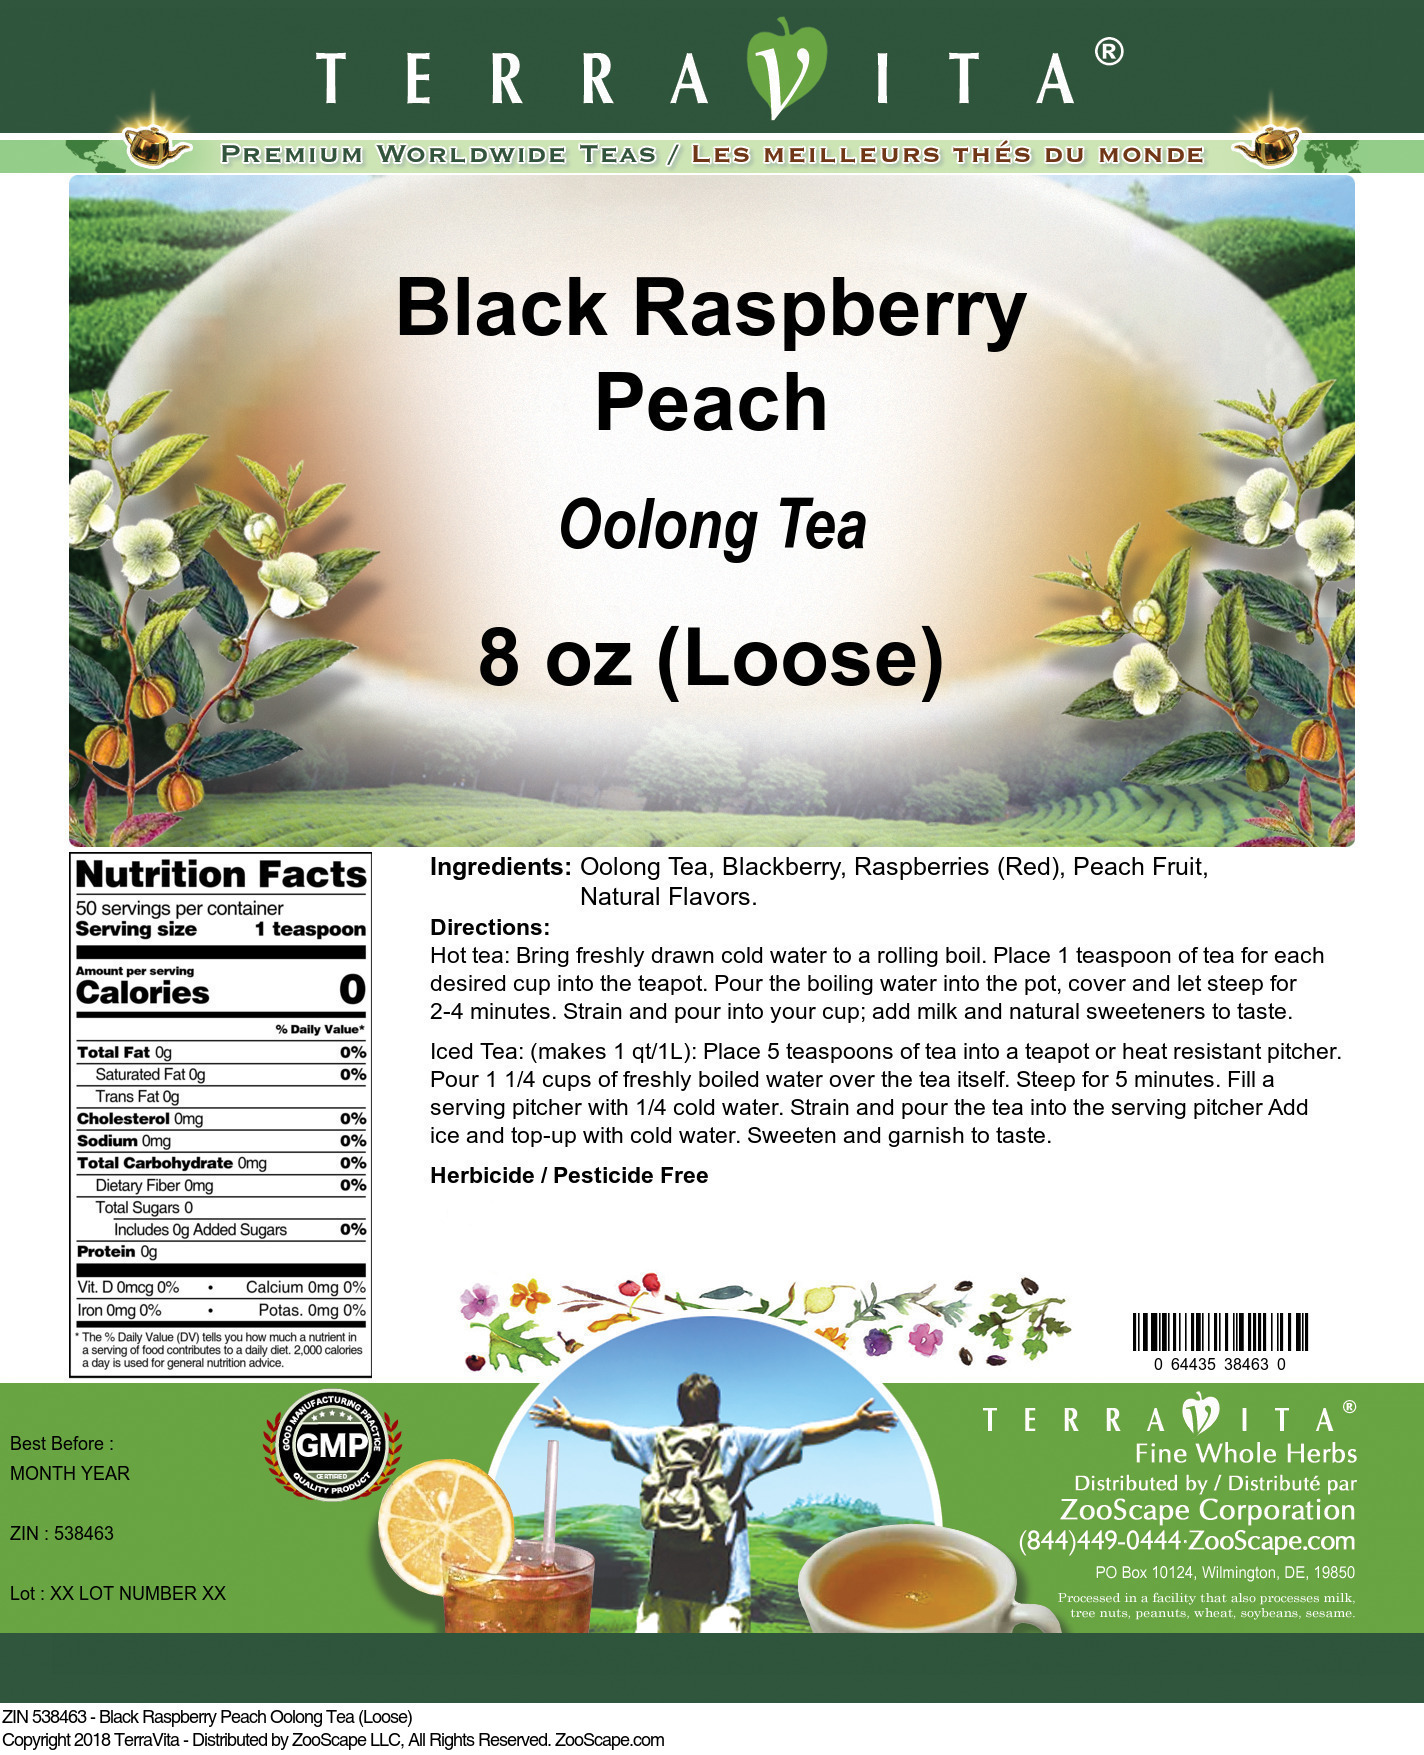 Black Raspberry Peach Oolong Tea (Loose)